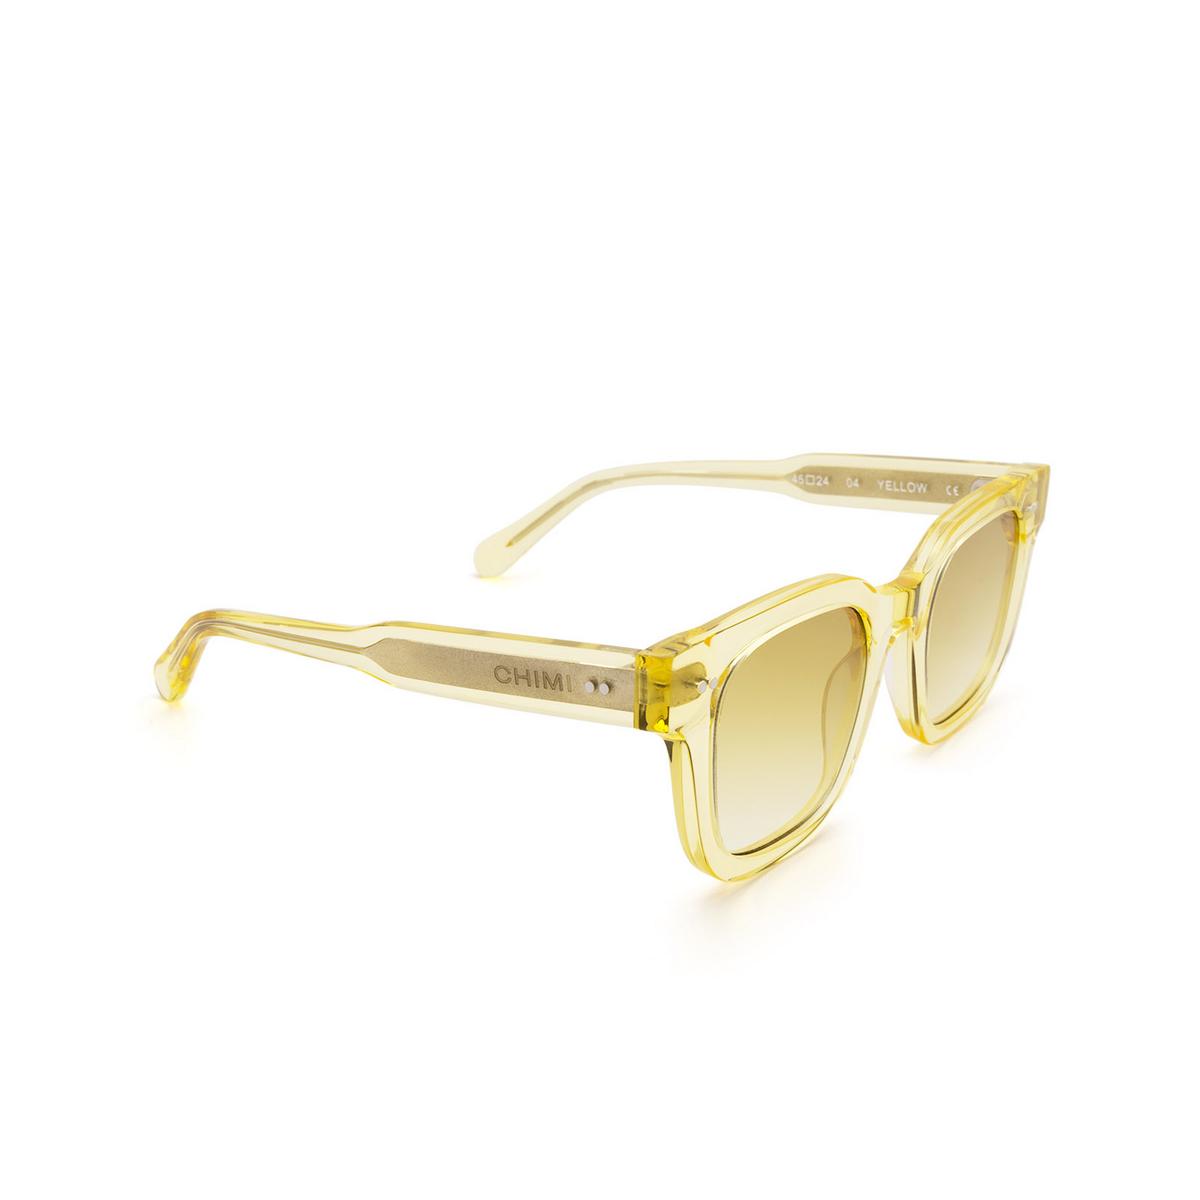 Chimi® Square Sunglasses: 04 color Yellow - three-quarters view.